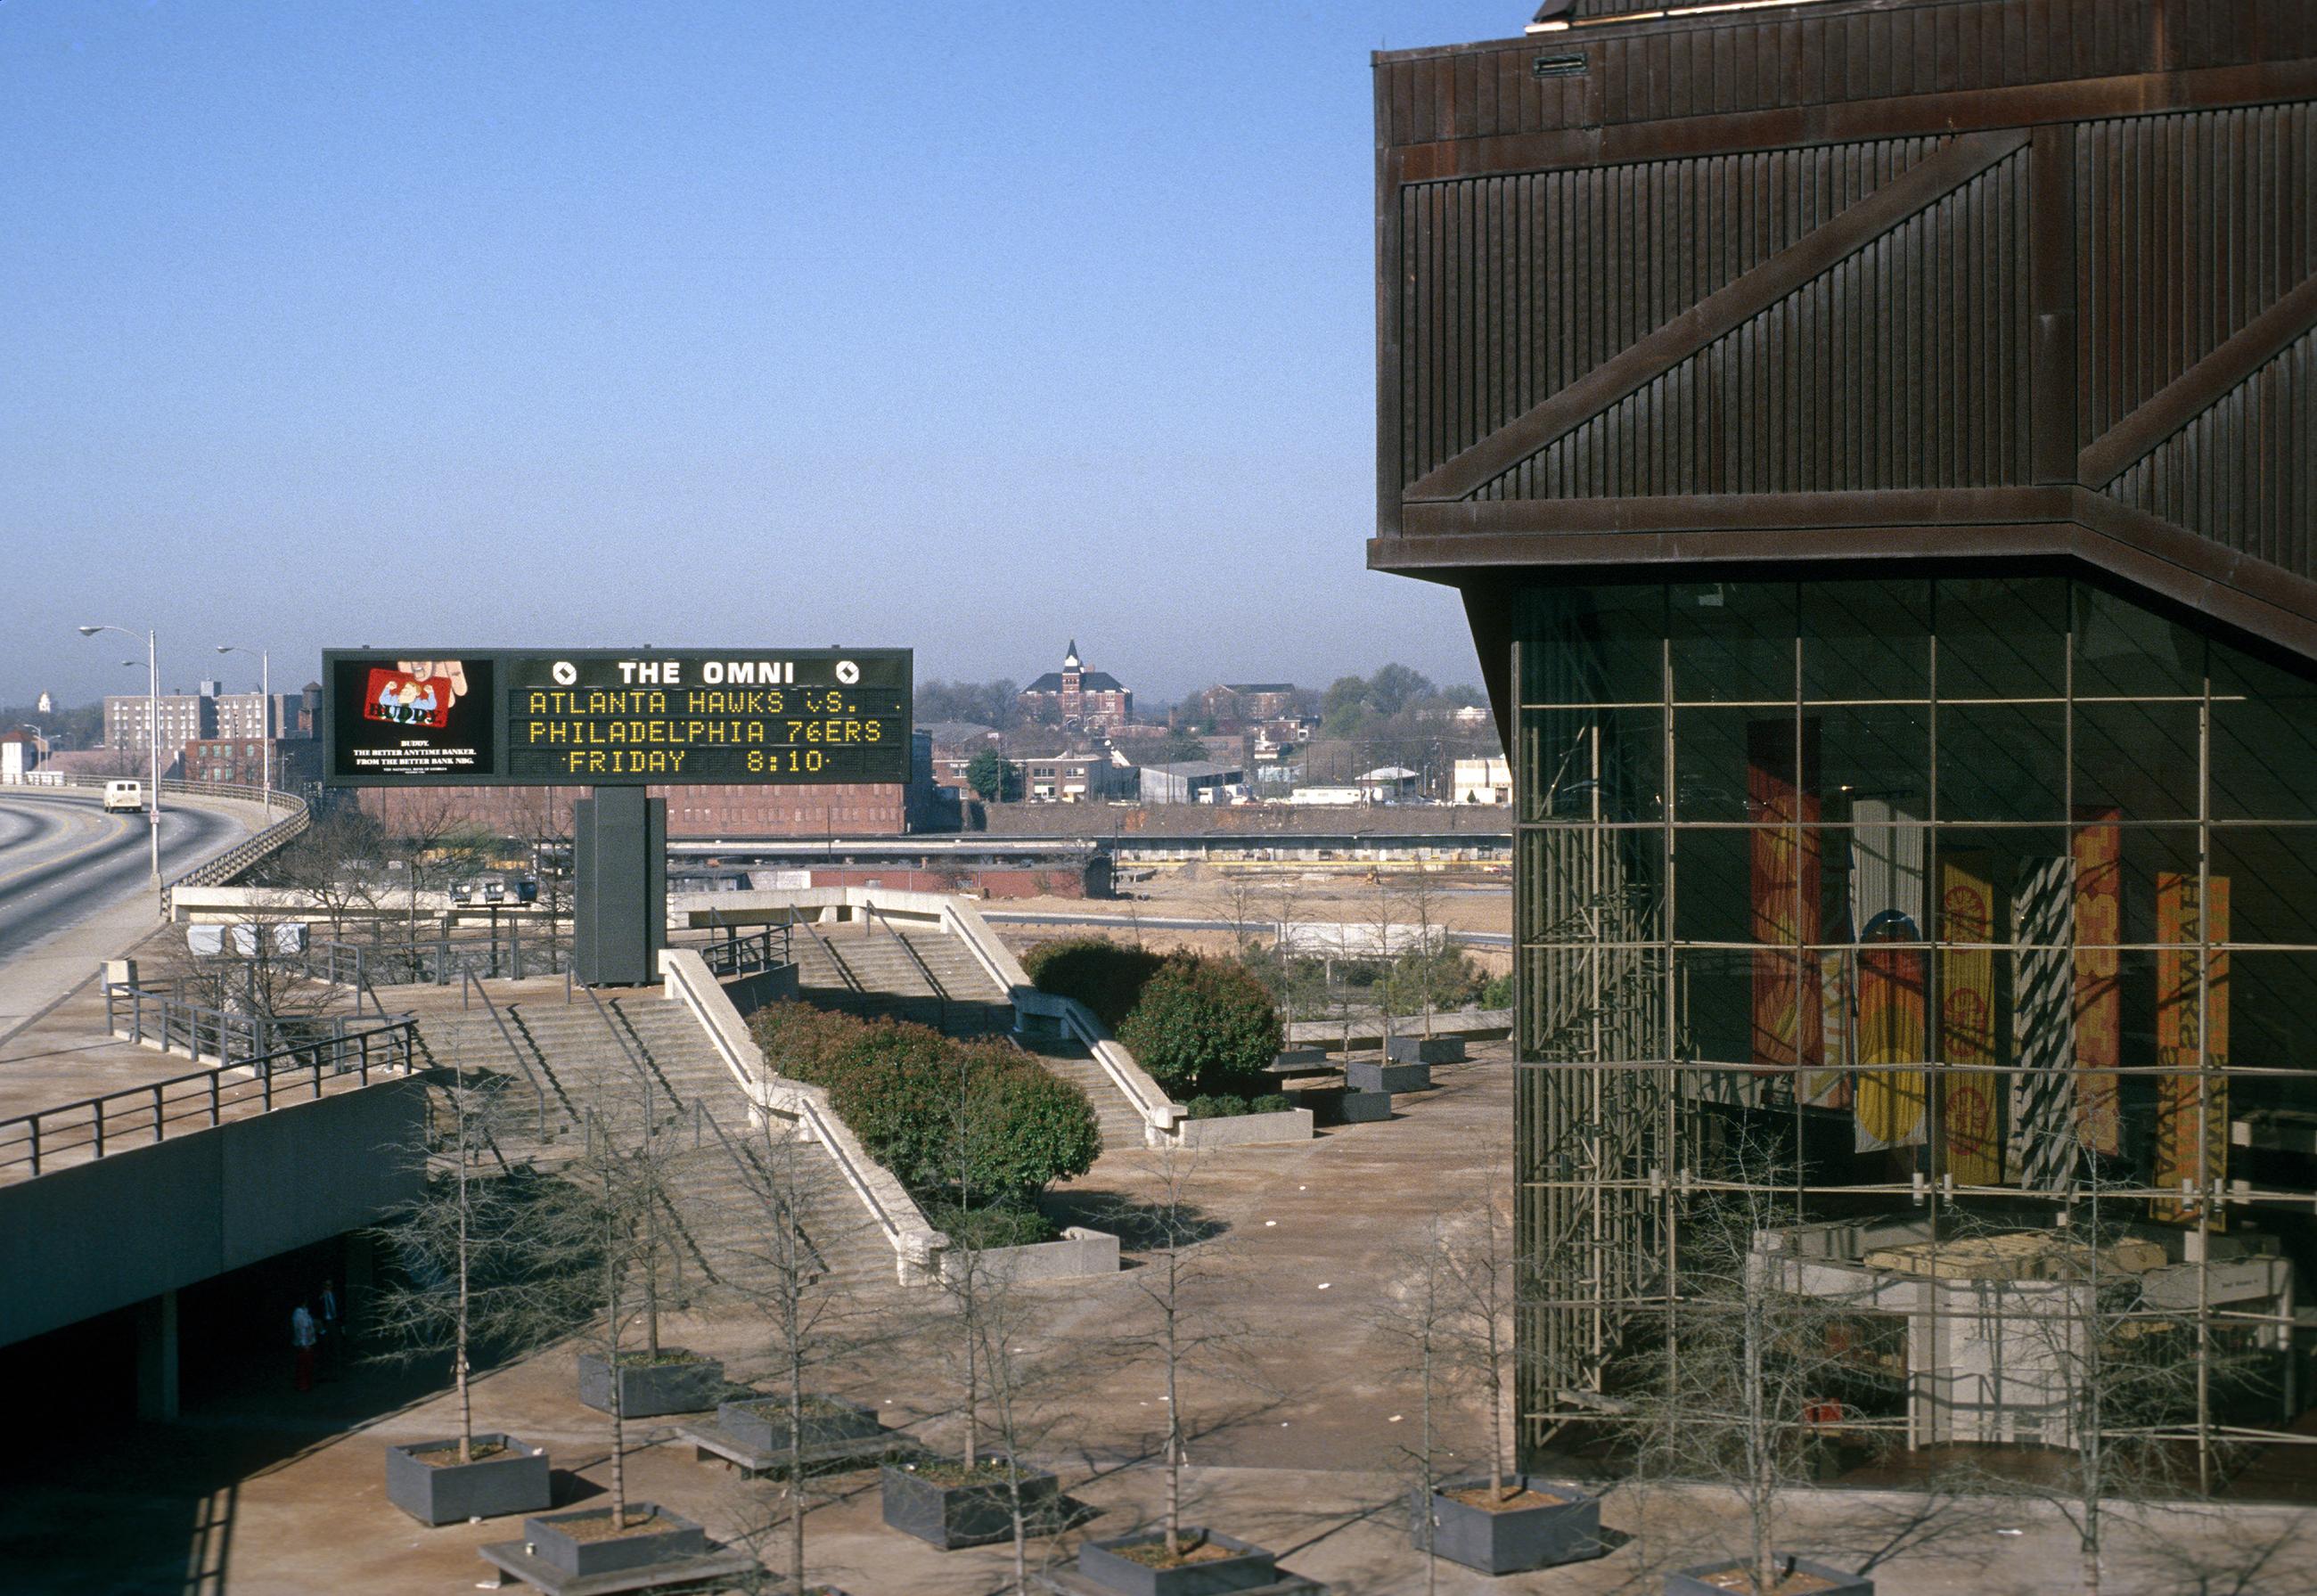 Omni_Coliseum_1977.jpg